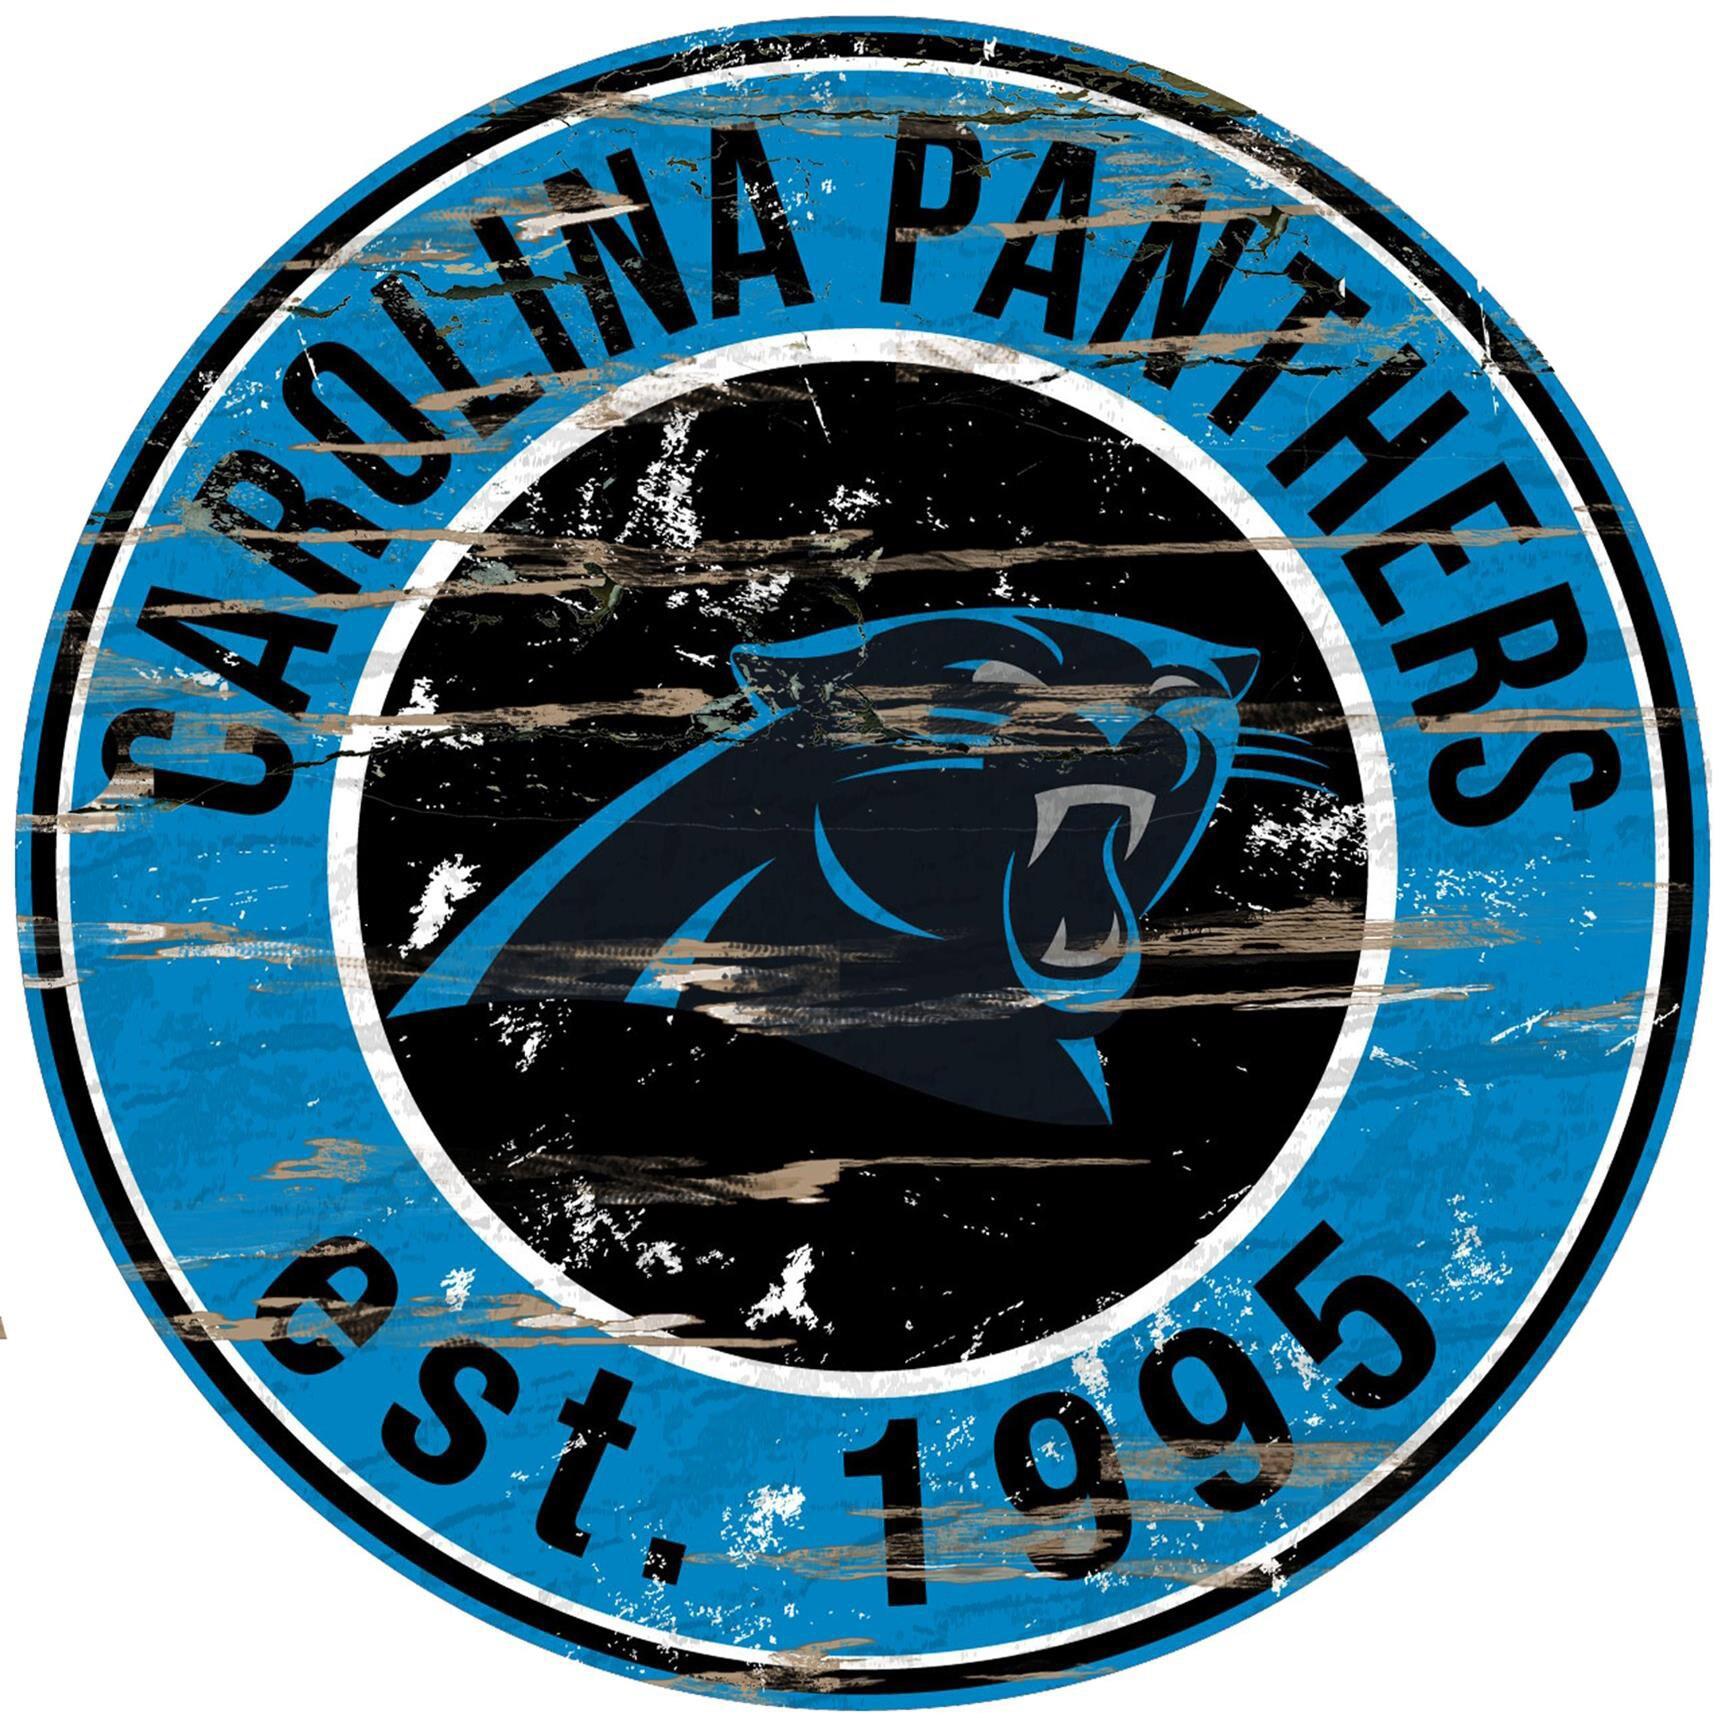 "Carolina Panthers 23.5"" Distressed Round Sign"